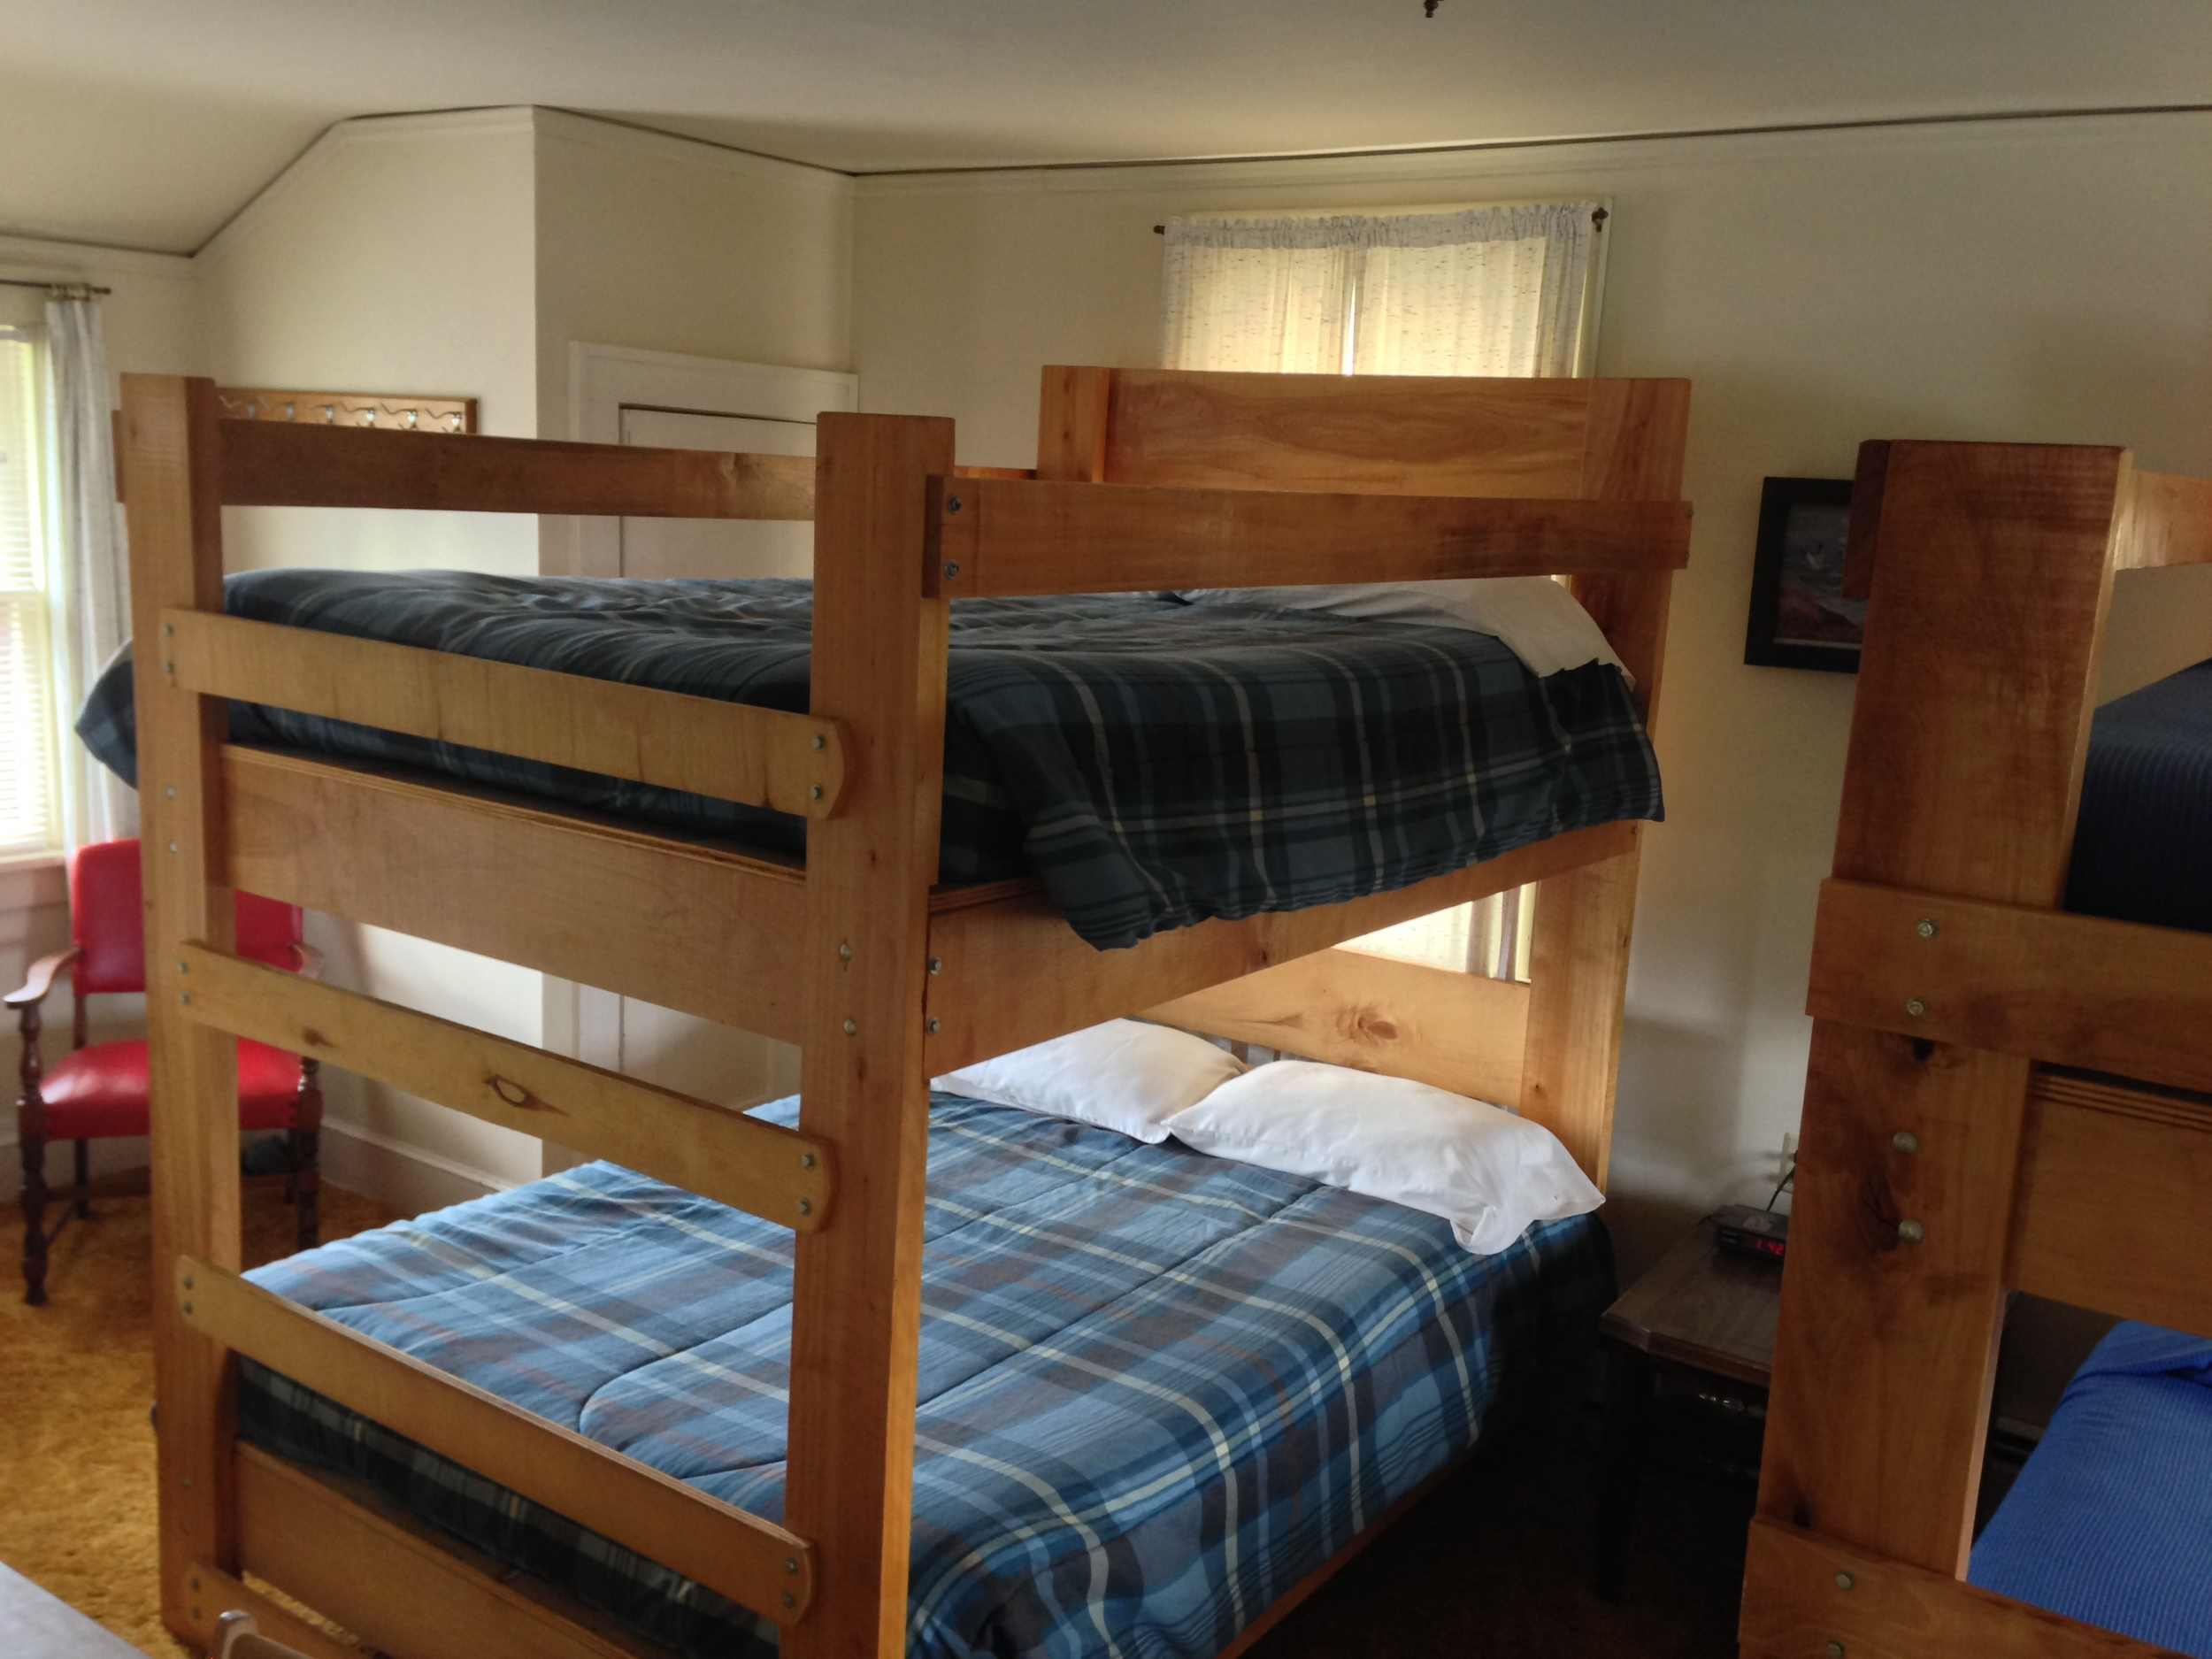 West house - Bedroom